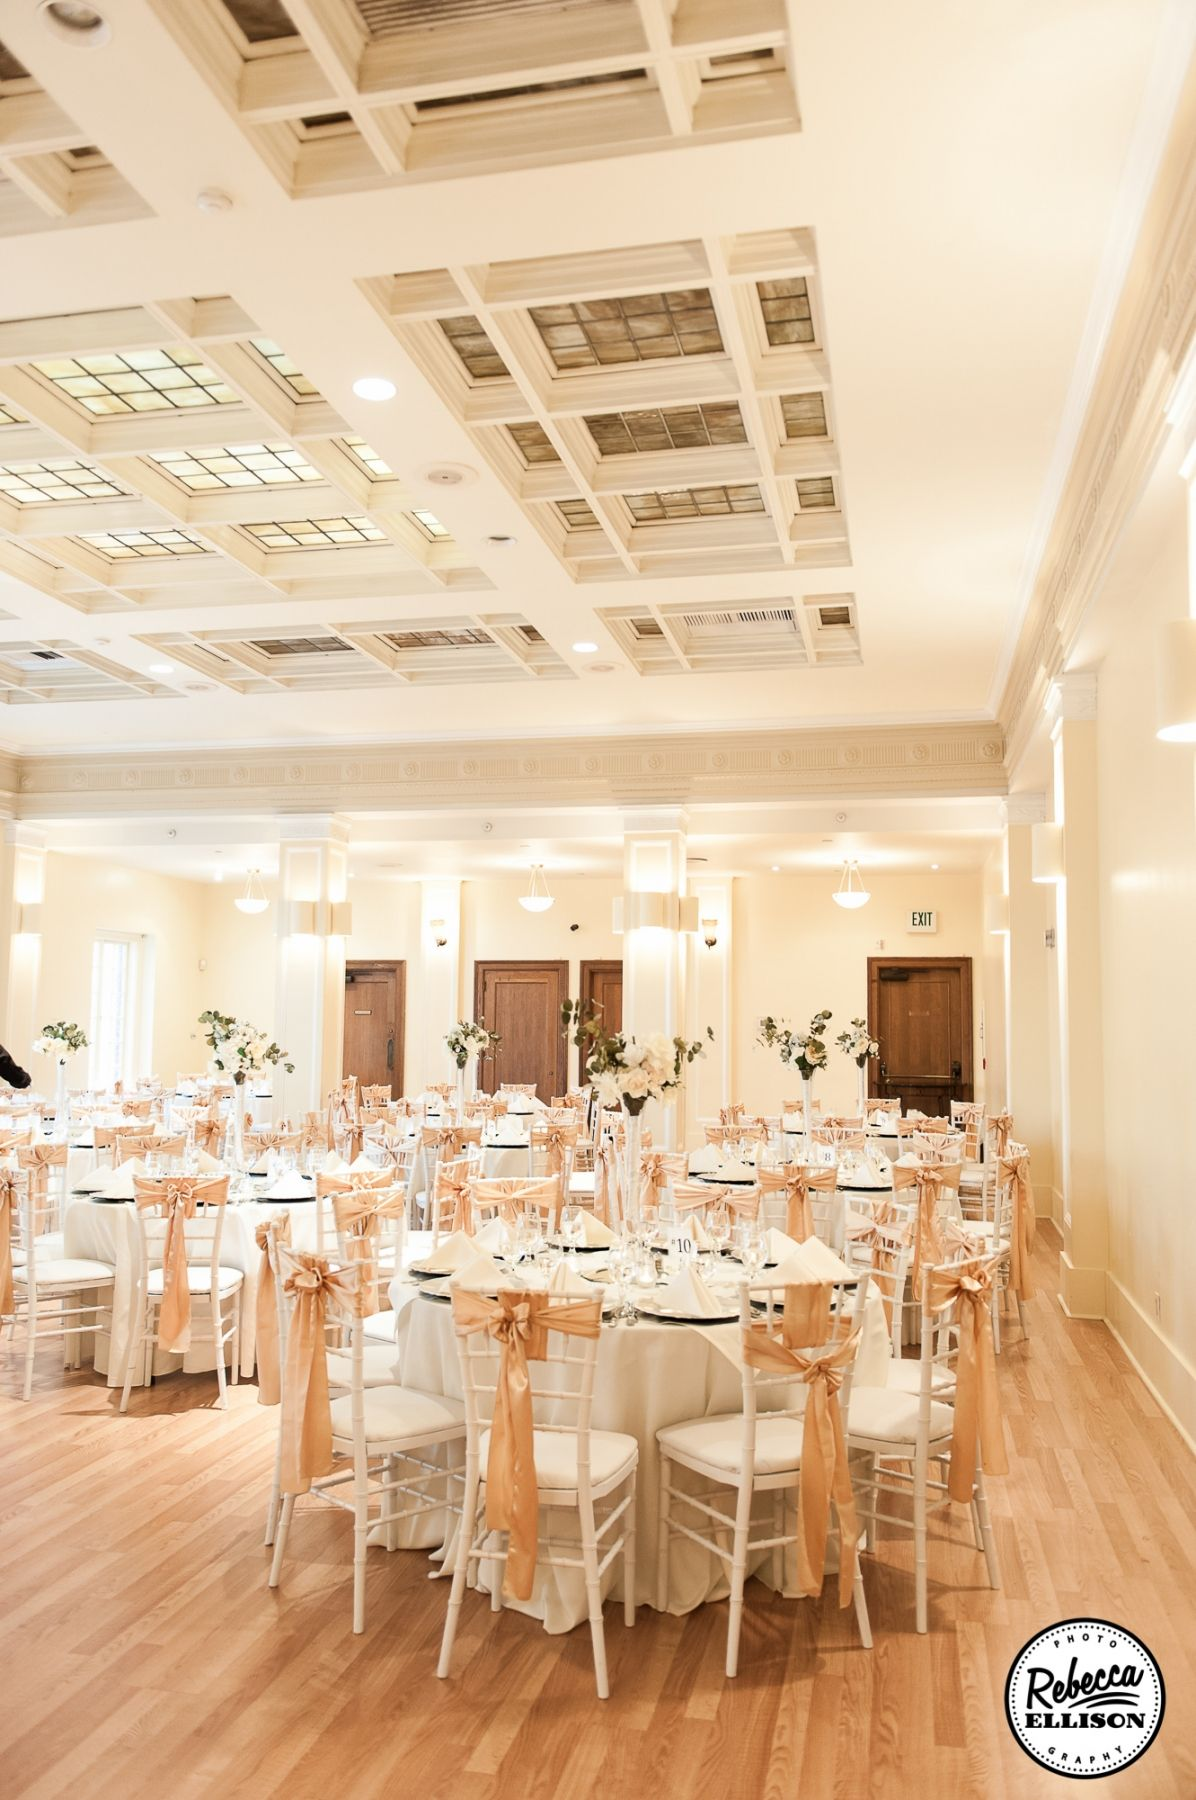 Monte Cristo Ballroom Wedding In Everett Of Jessica And Issac